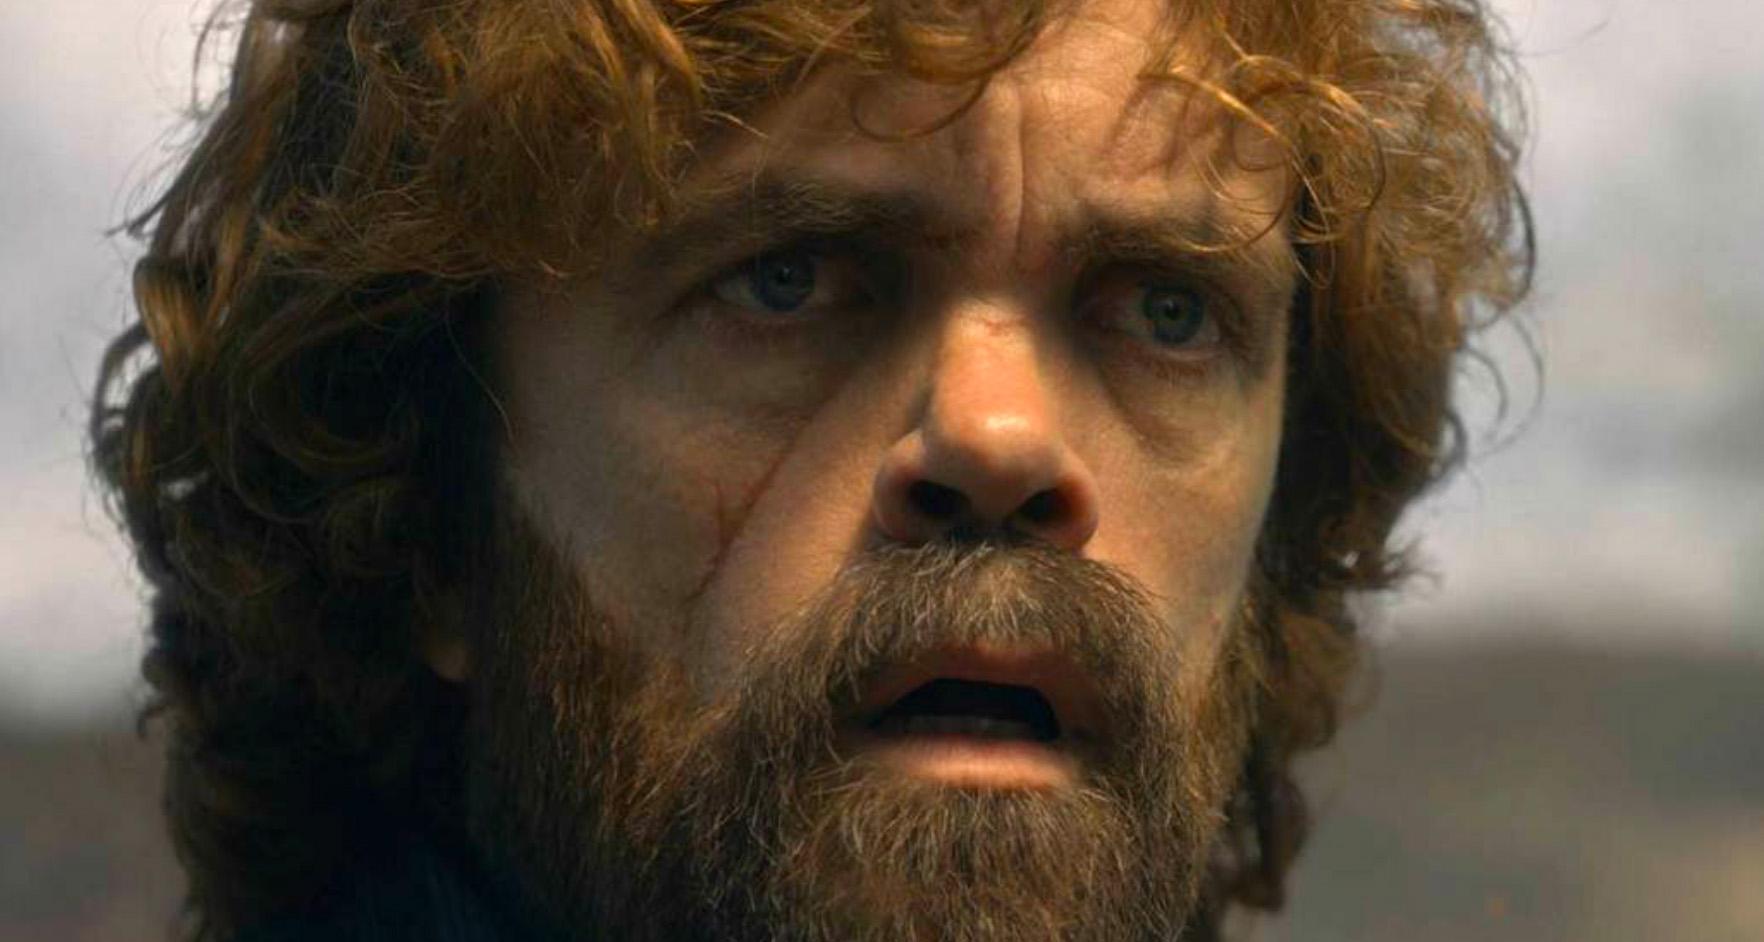 House of the Dragon finner sted 300 år før Game of Thrones, her ved Peter Dinklage som Tyrion Lannister (HBO)